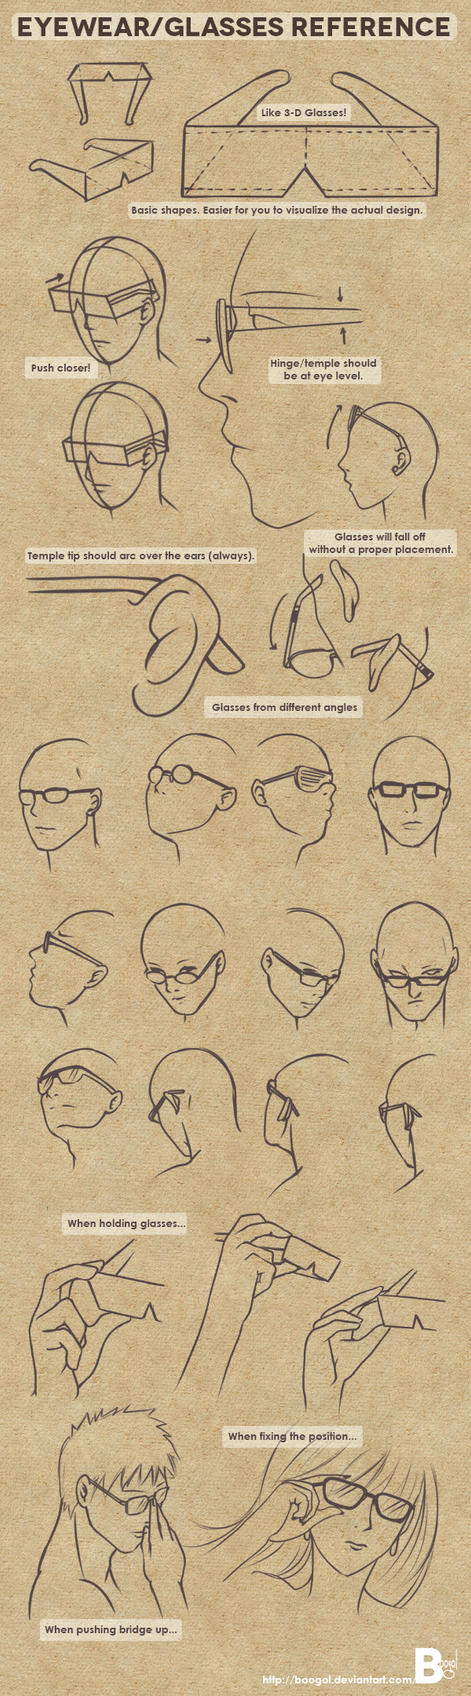 Eyewear/Glasses Reference by Boogol